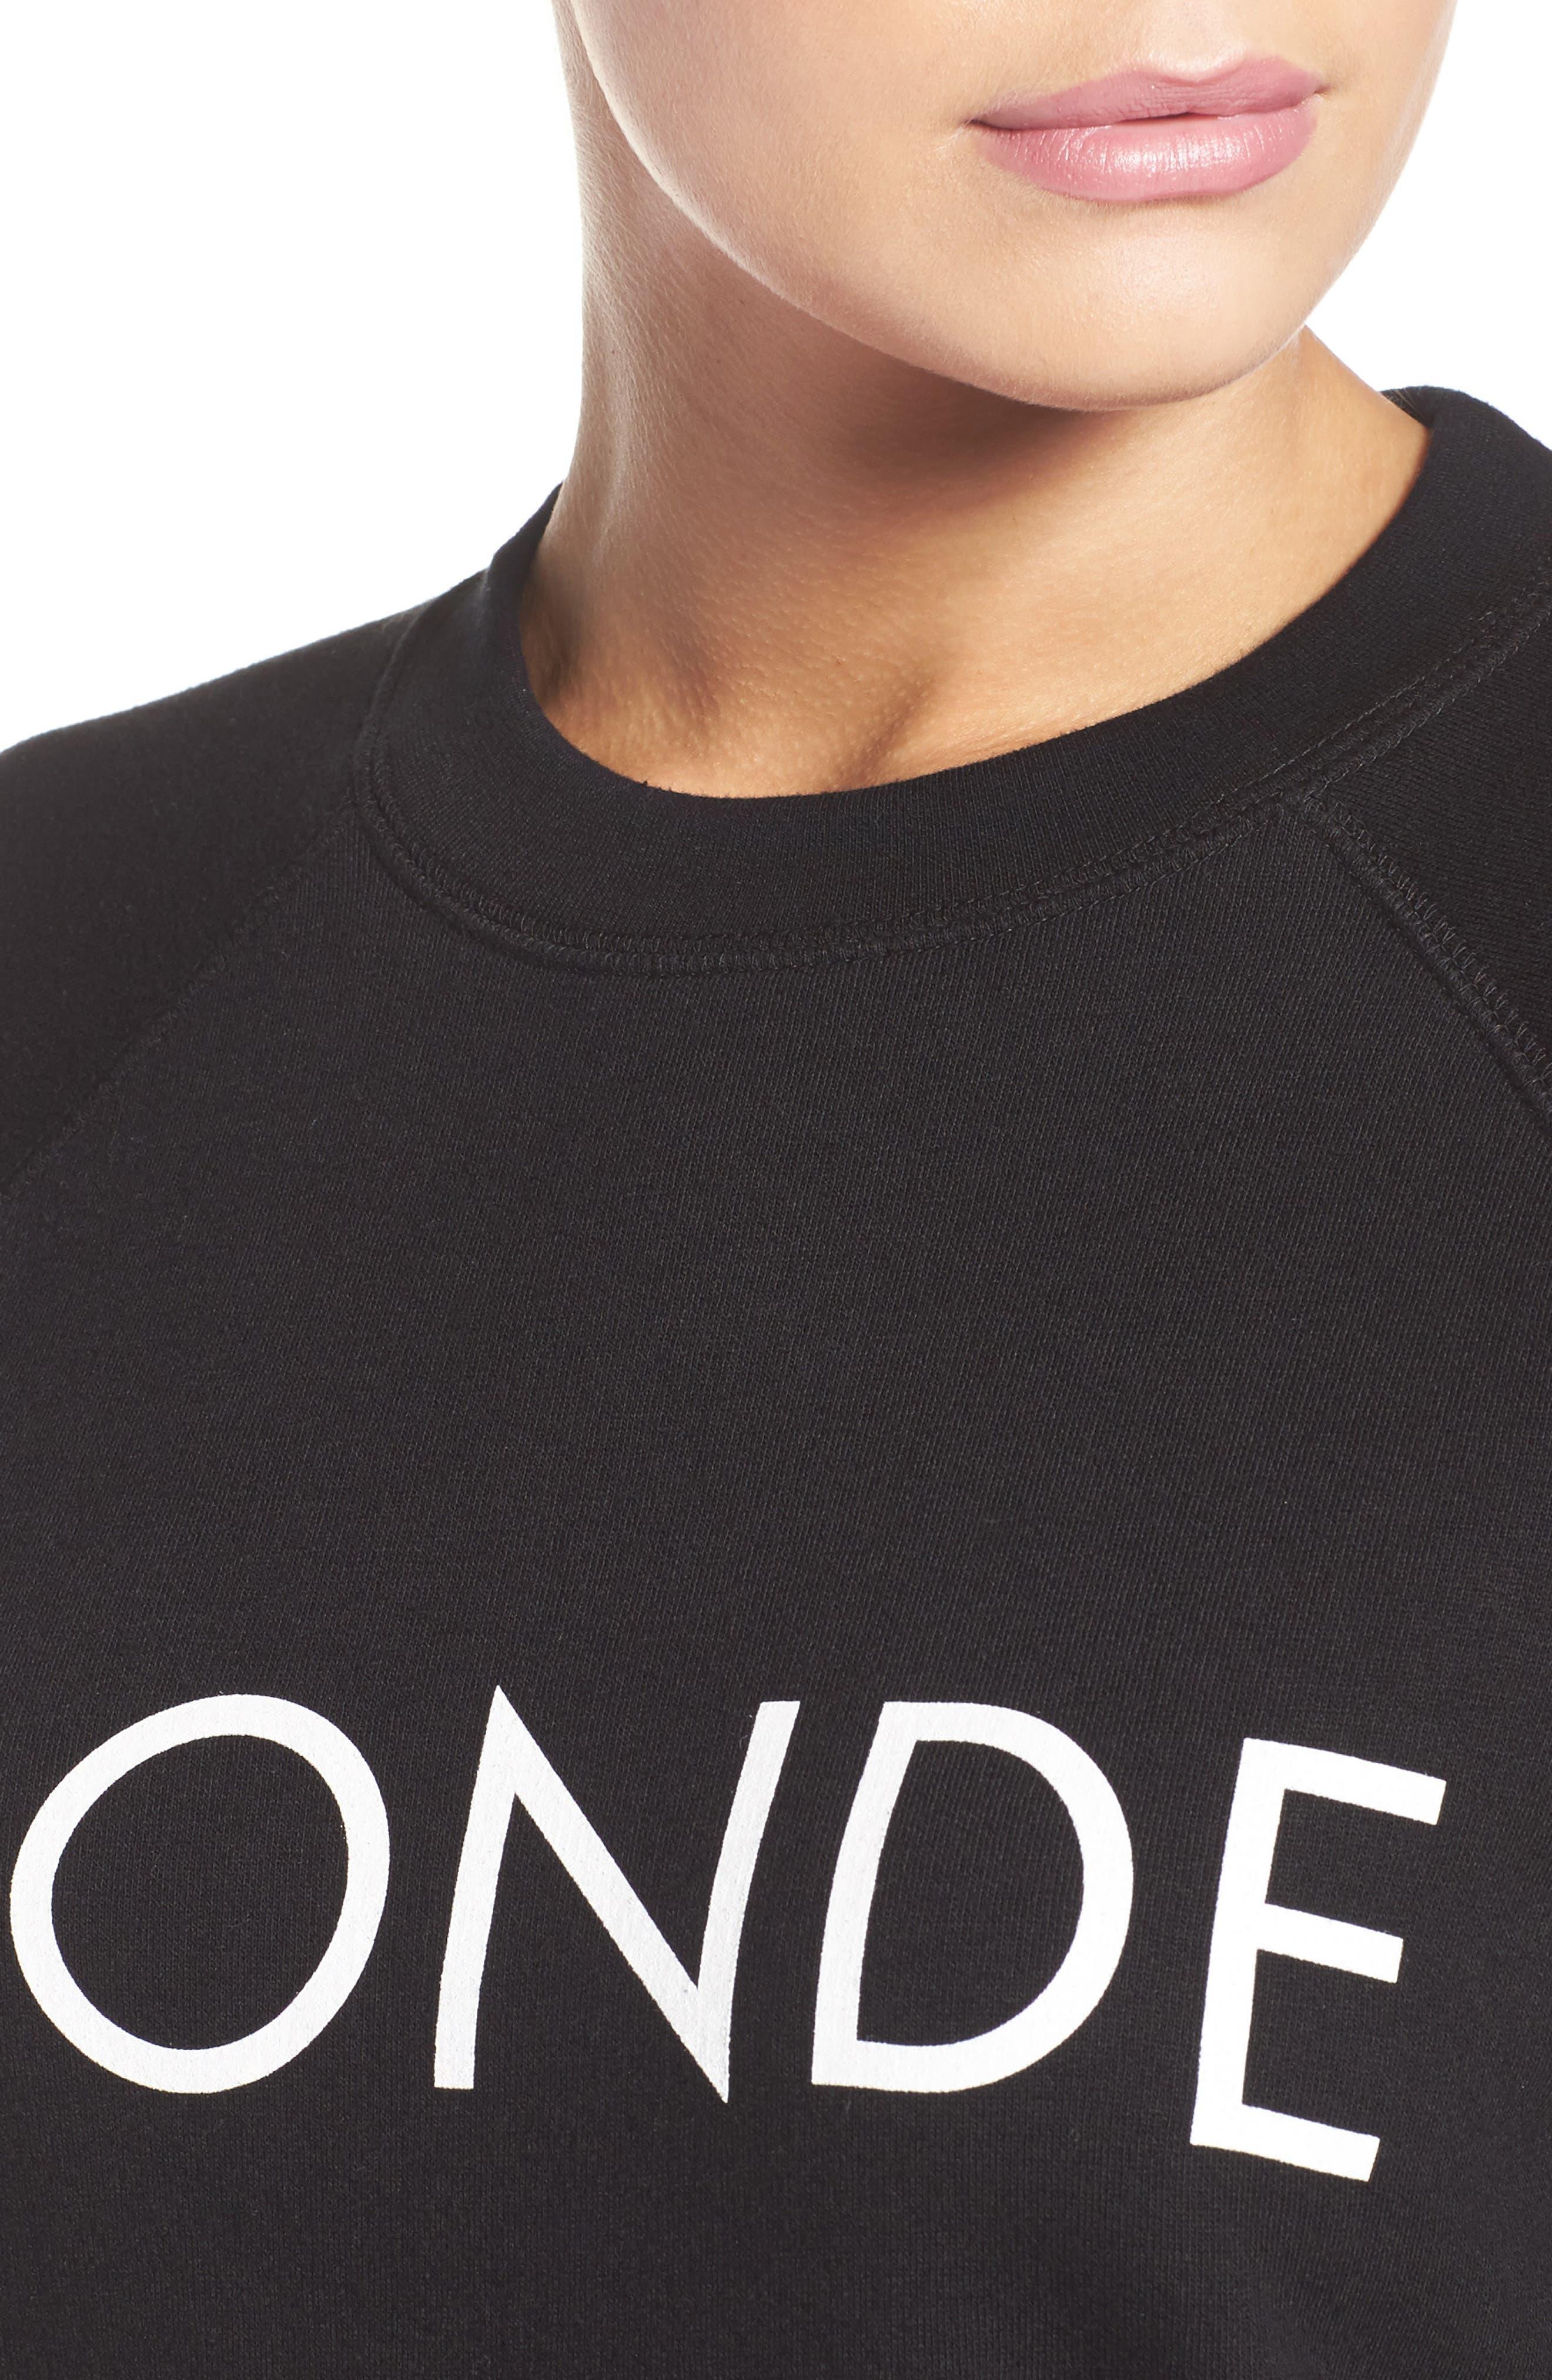 Blonde Crewneck Sweatshirt,                             Alternate thumbnail 4, color,                             001